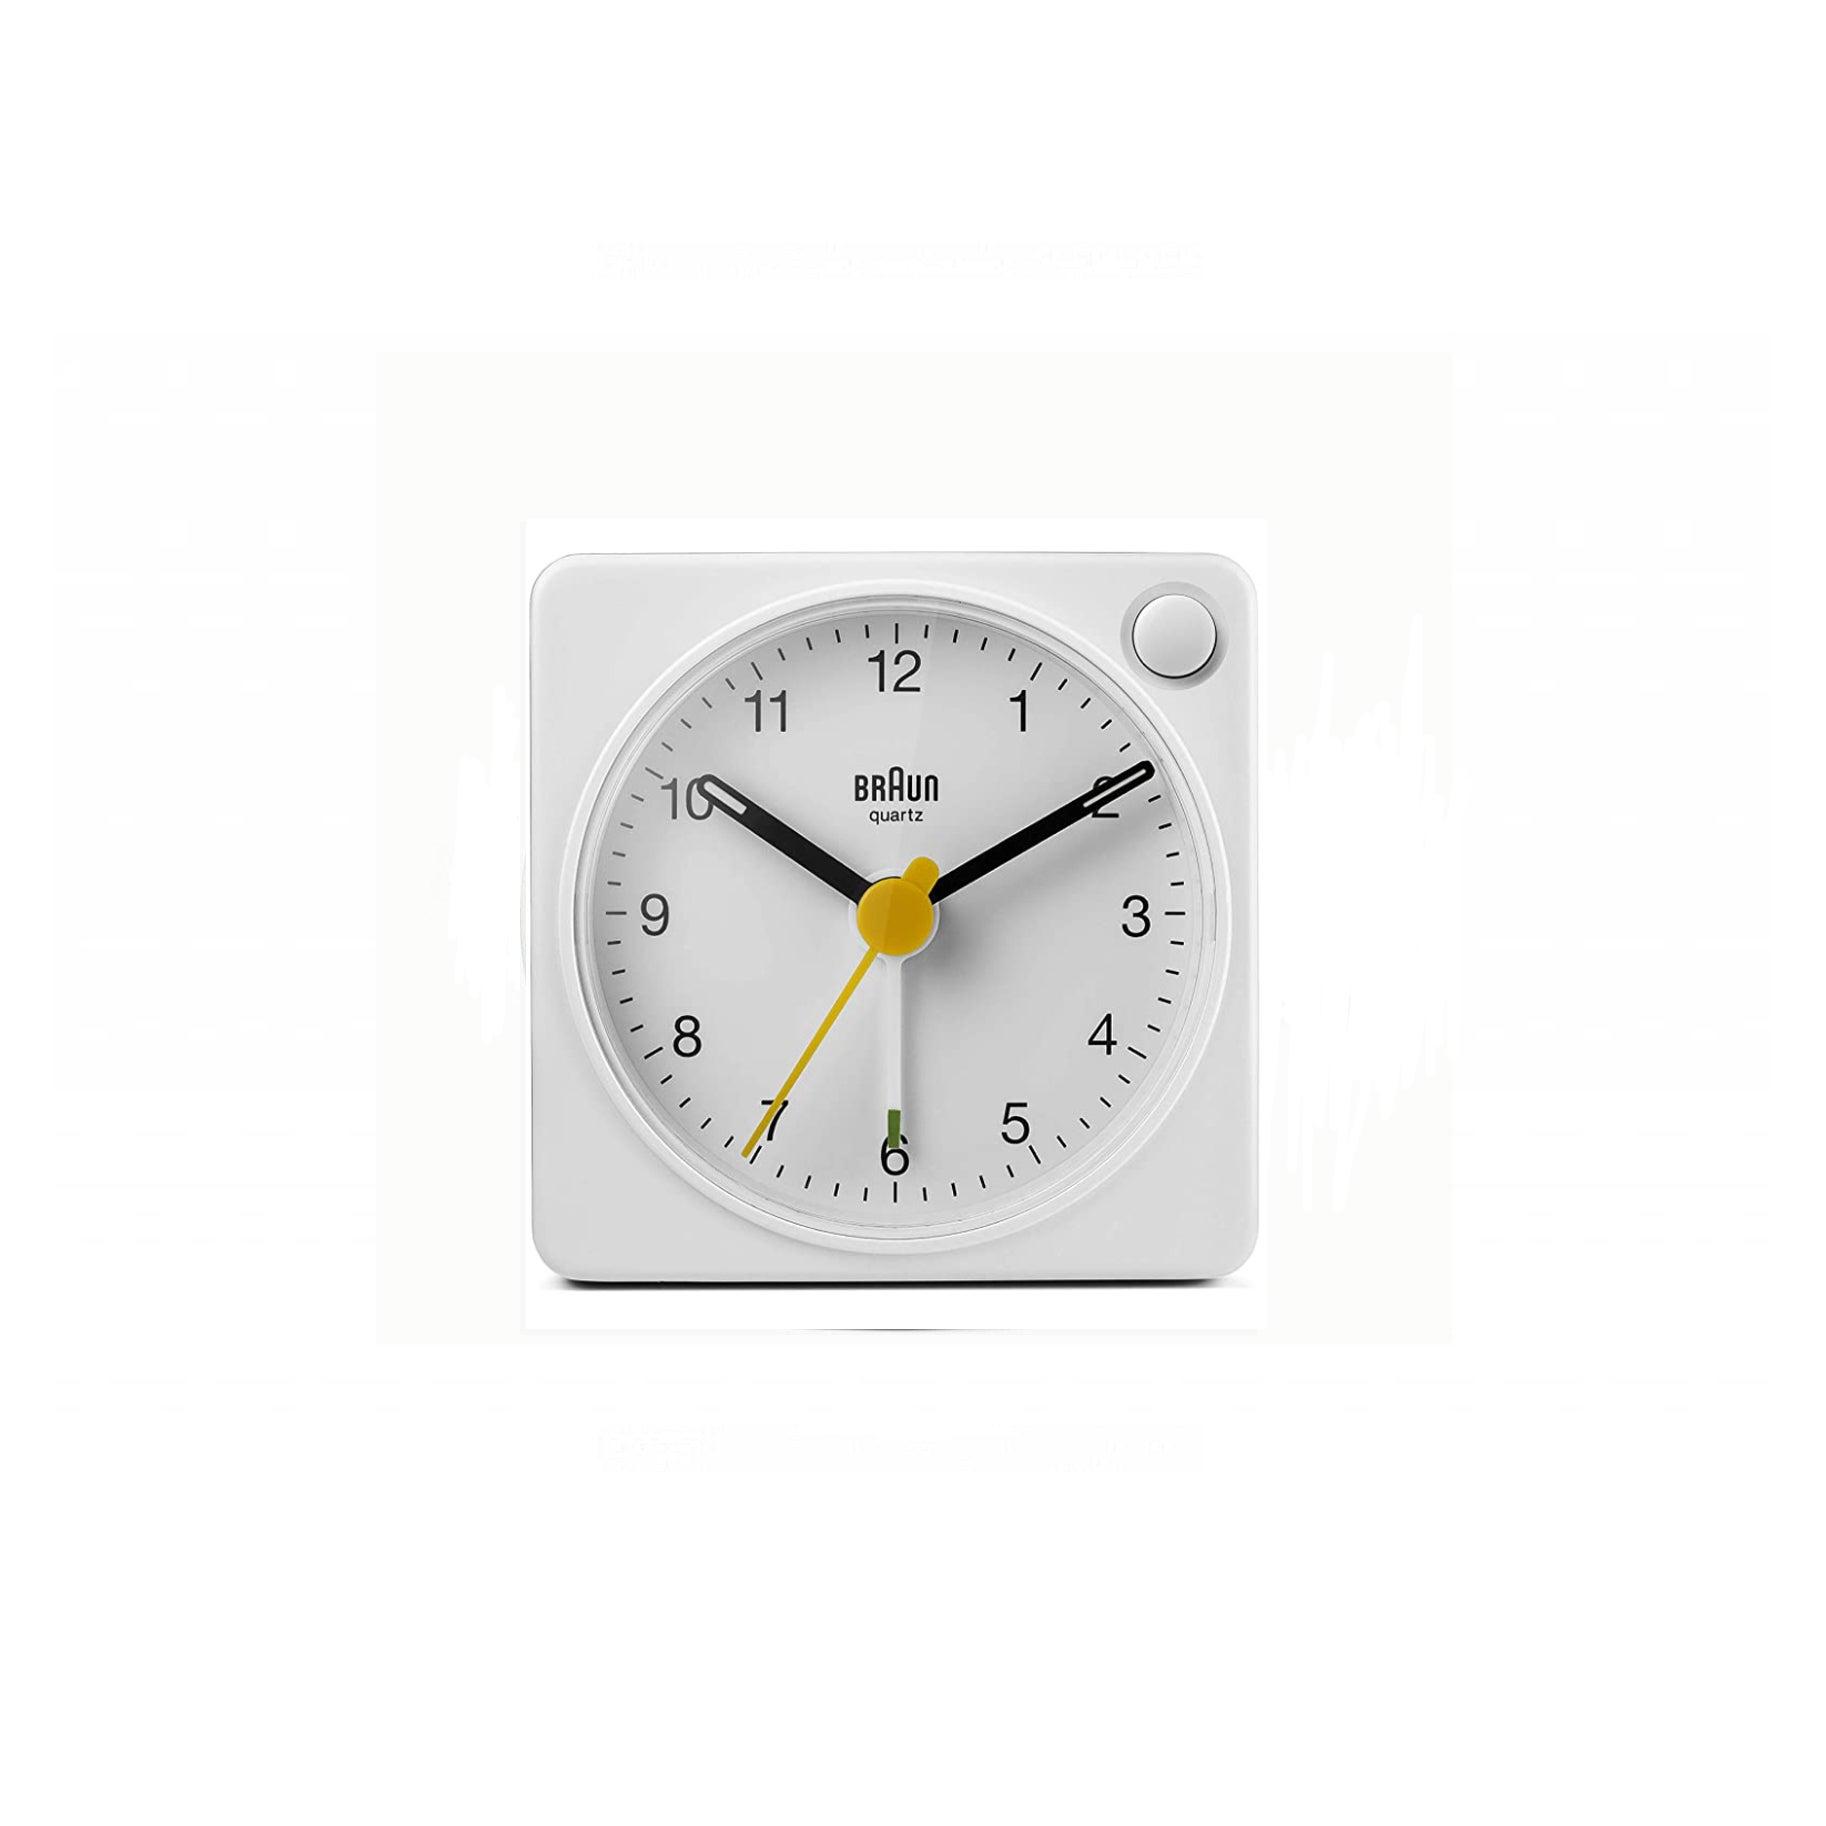 The-Best-Alarm-Clock-Option-BraunClassic-Travel-Analog-Clock